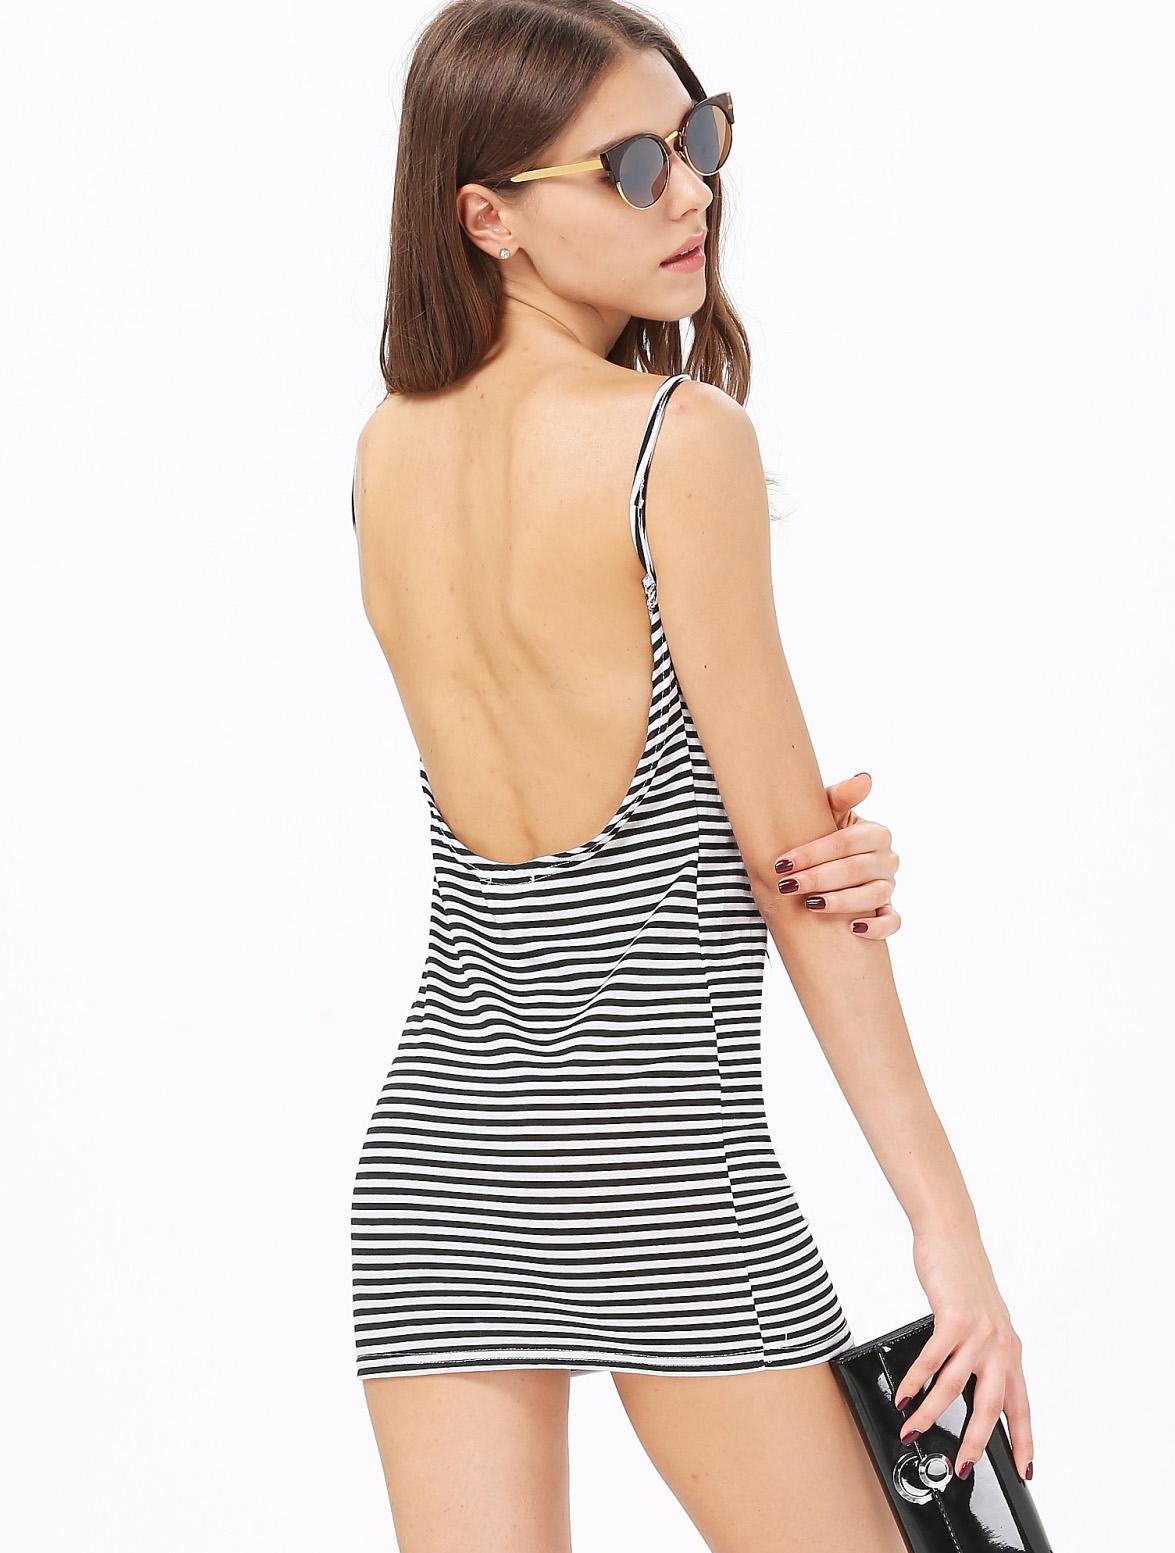 Black White Striped Spaghetti Strap Backless Dress - Sheinside.com